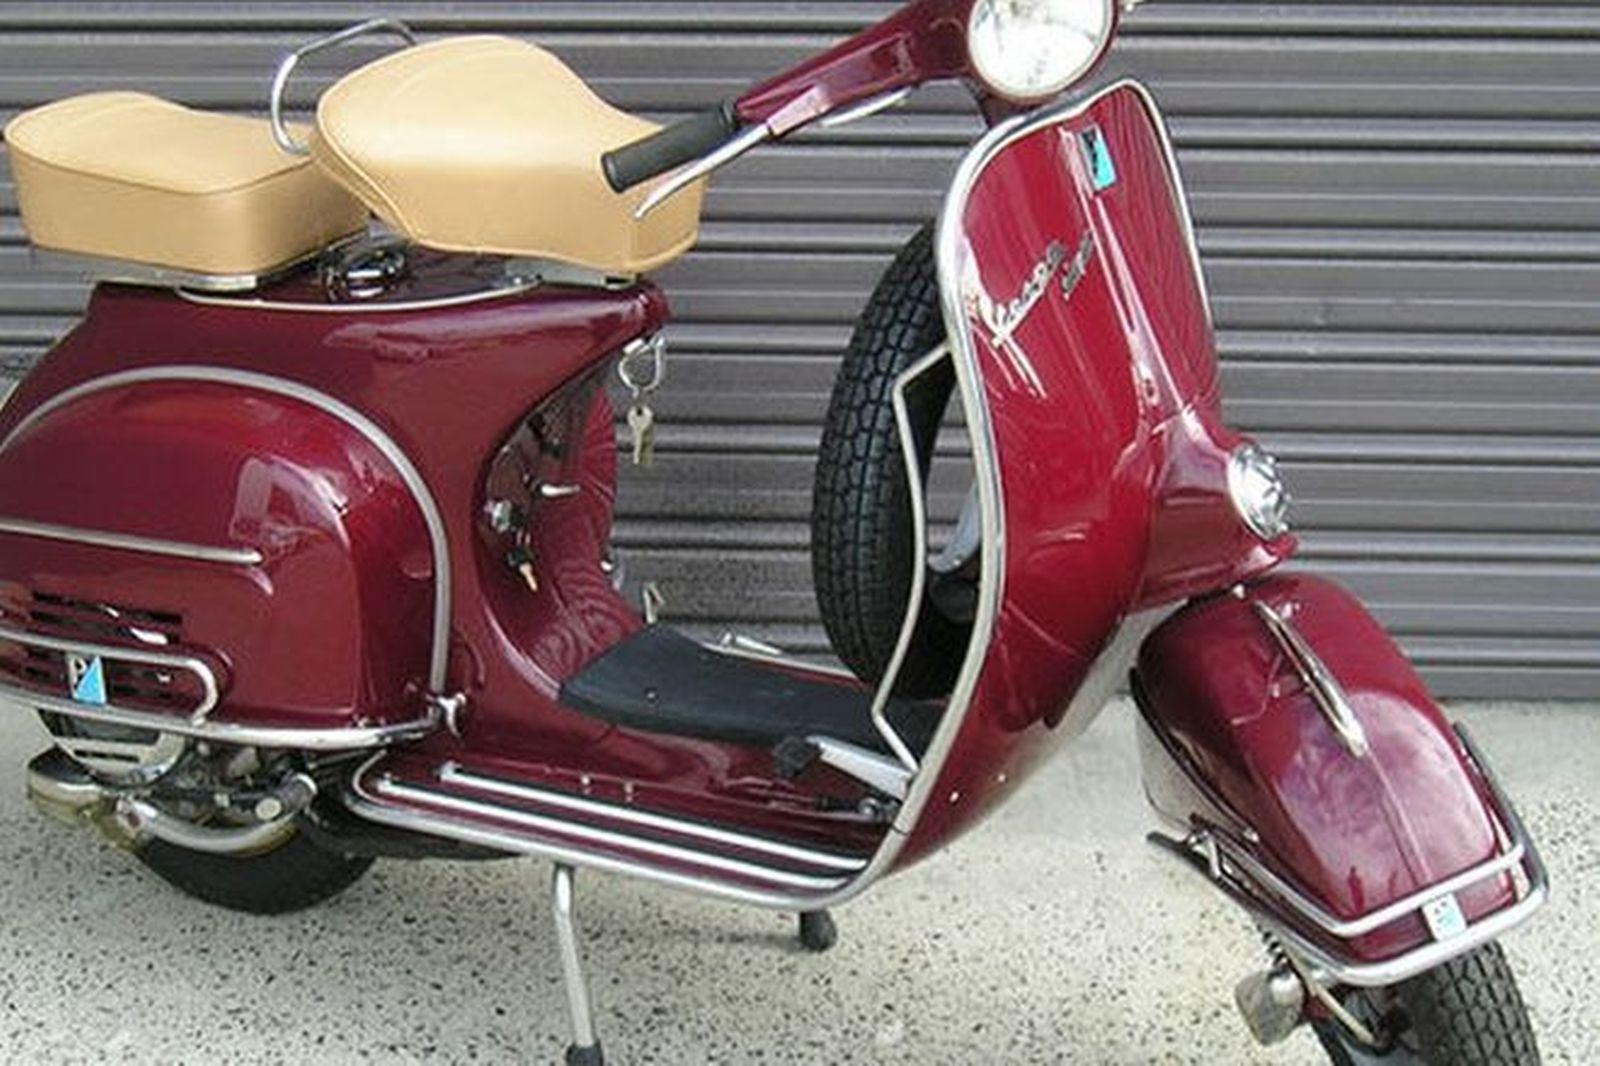 sold vespa super 150 scooter auctions lot 9 shannons. Black Bedroom Furniture Sets. Home Design Ideas